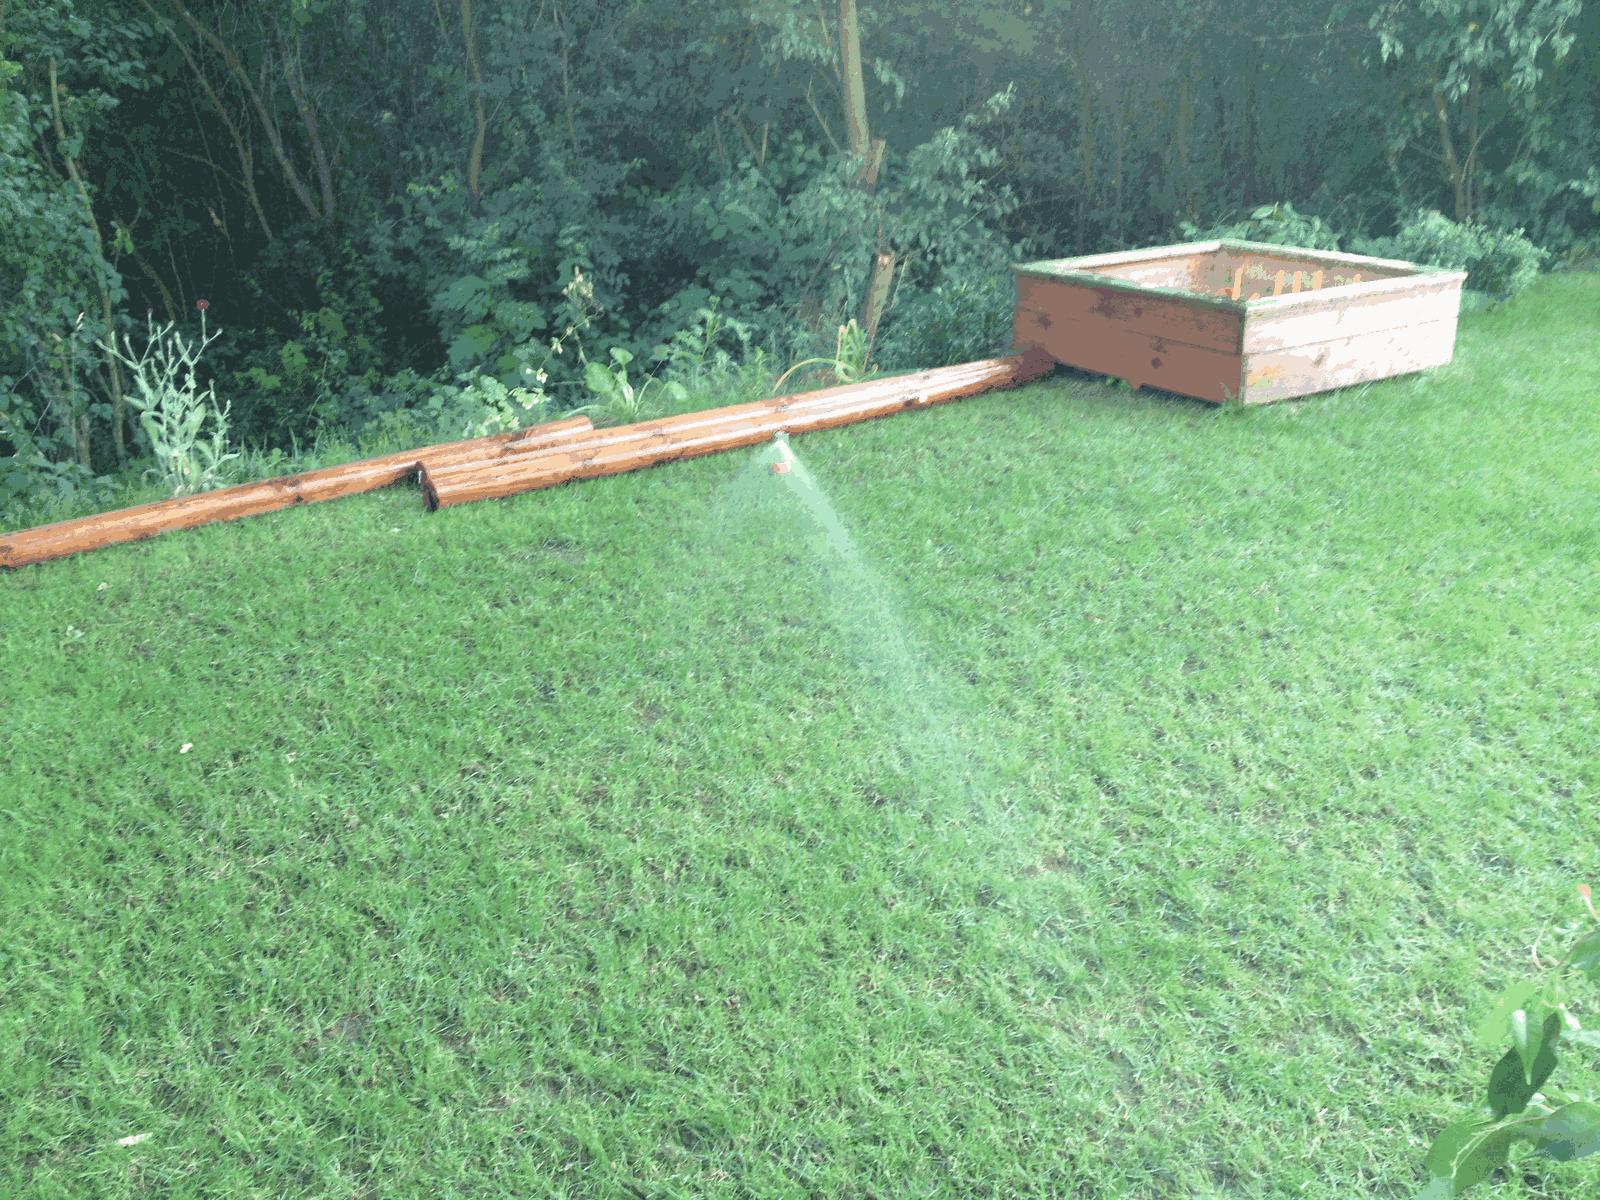 Rasen Bewässerungssystem rasen bewässerung hausbau ein baublog